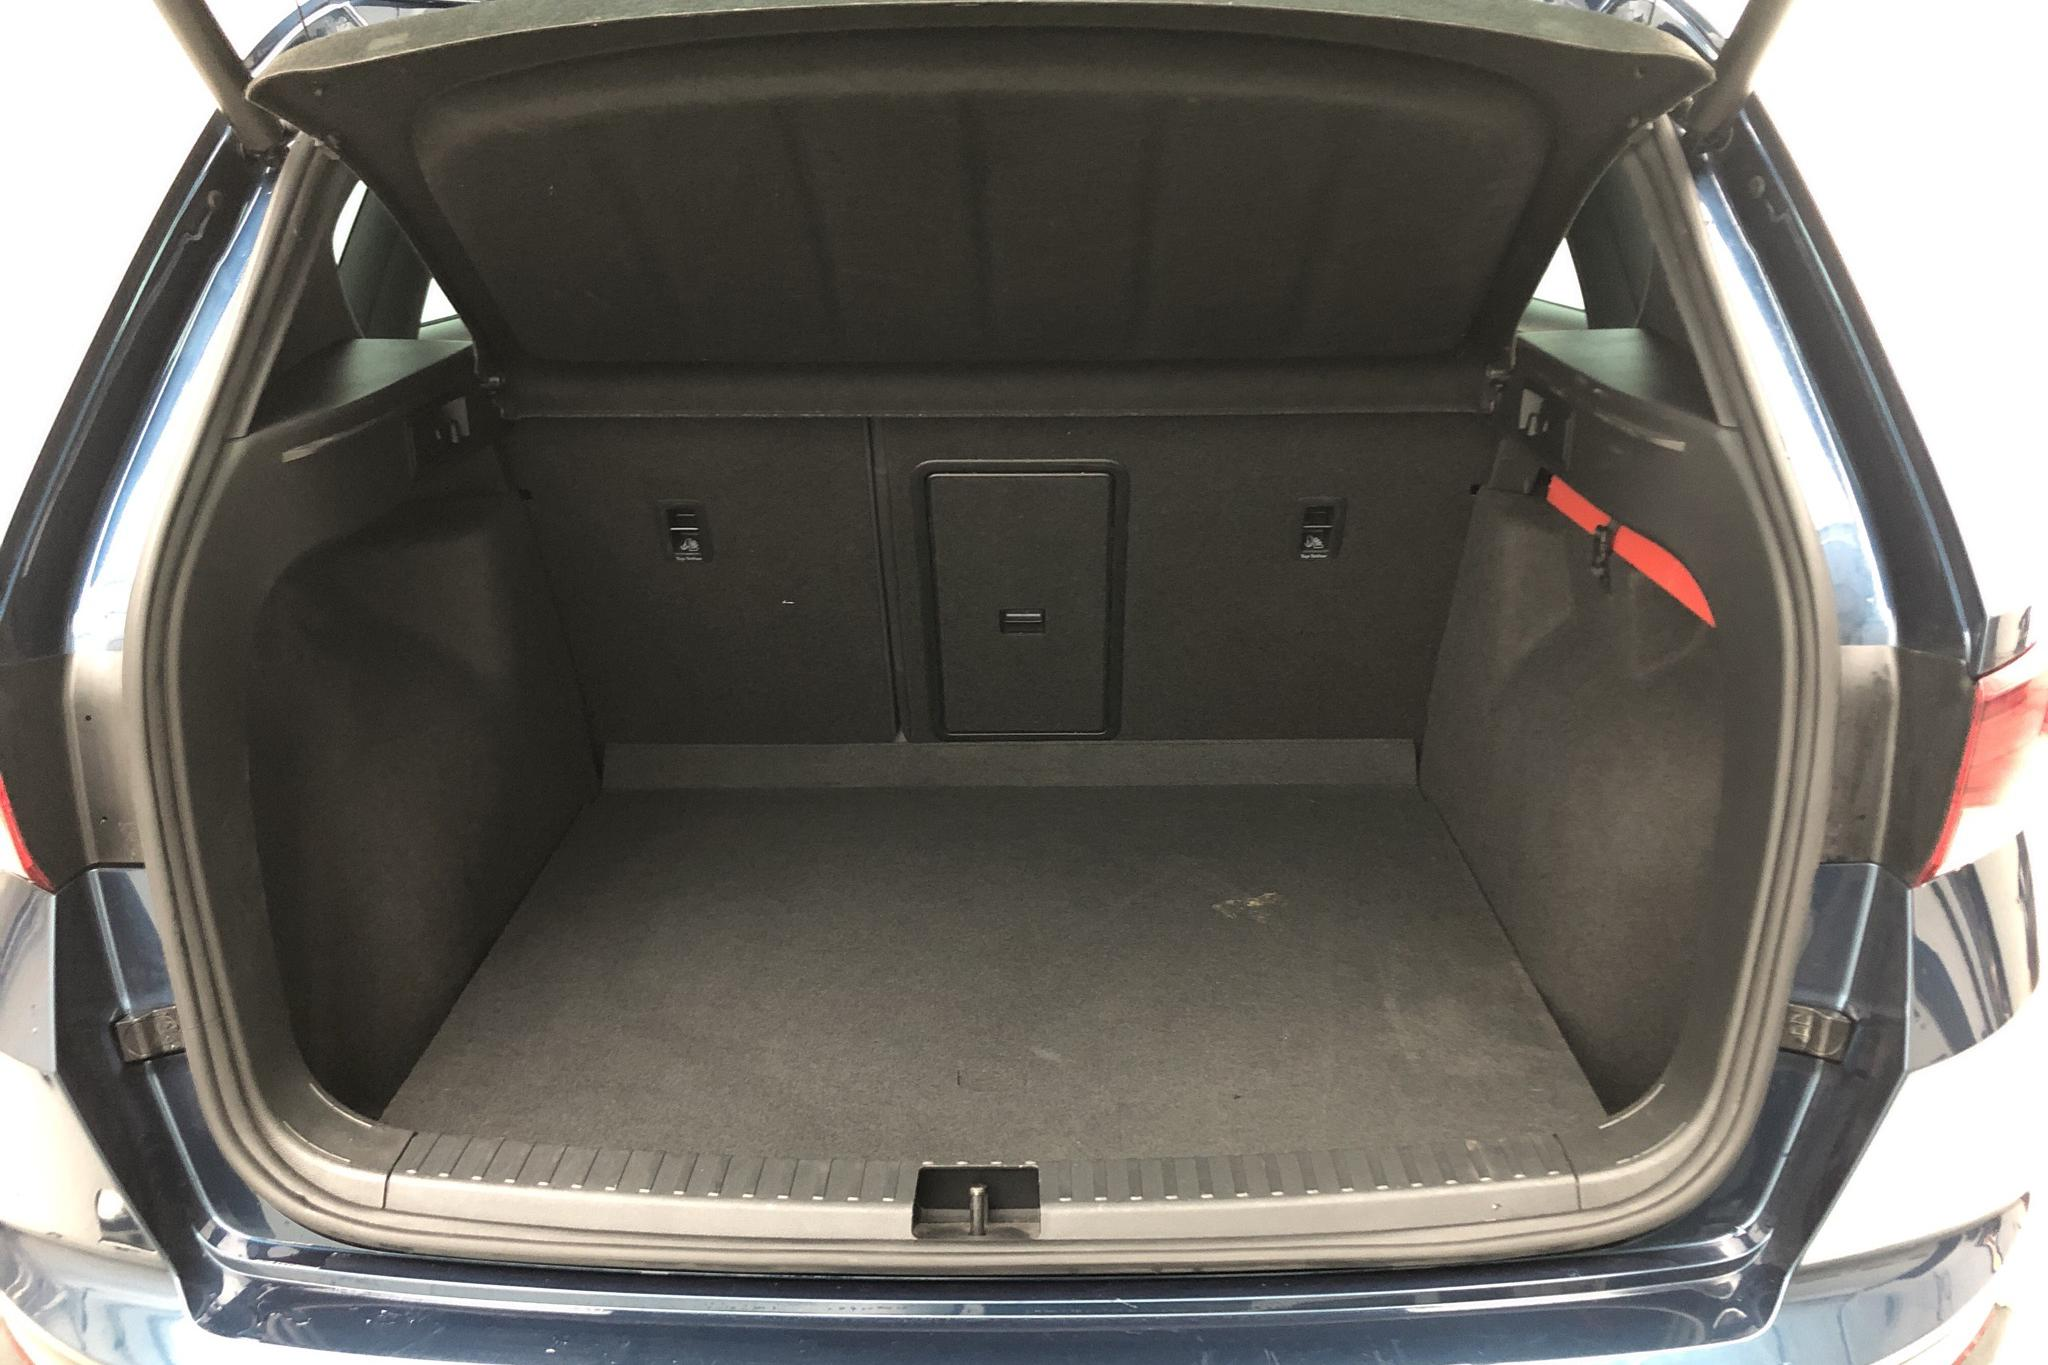 Seat Ateca 1.4 TSI ACT 4Drive (150hk)Nav. - 7 300 mil - Manuell - blå - 2017